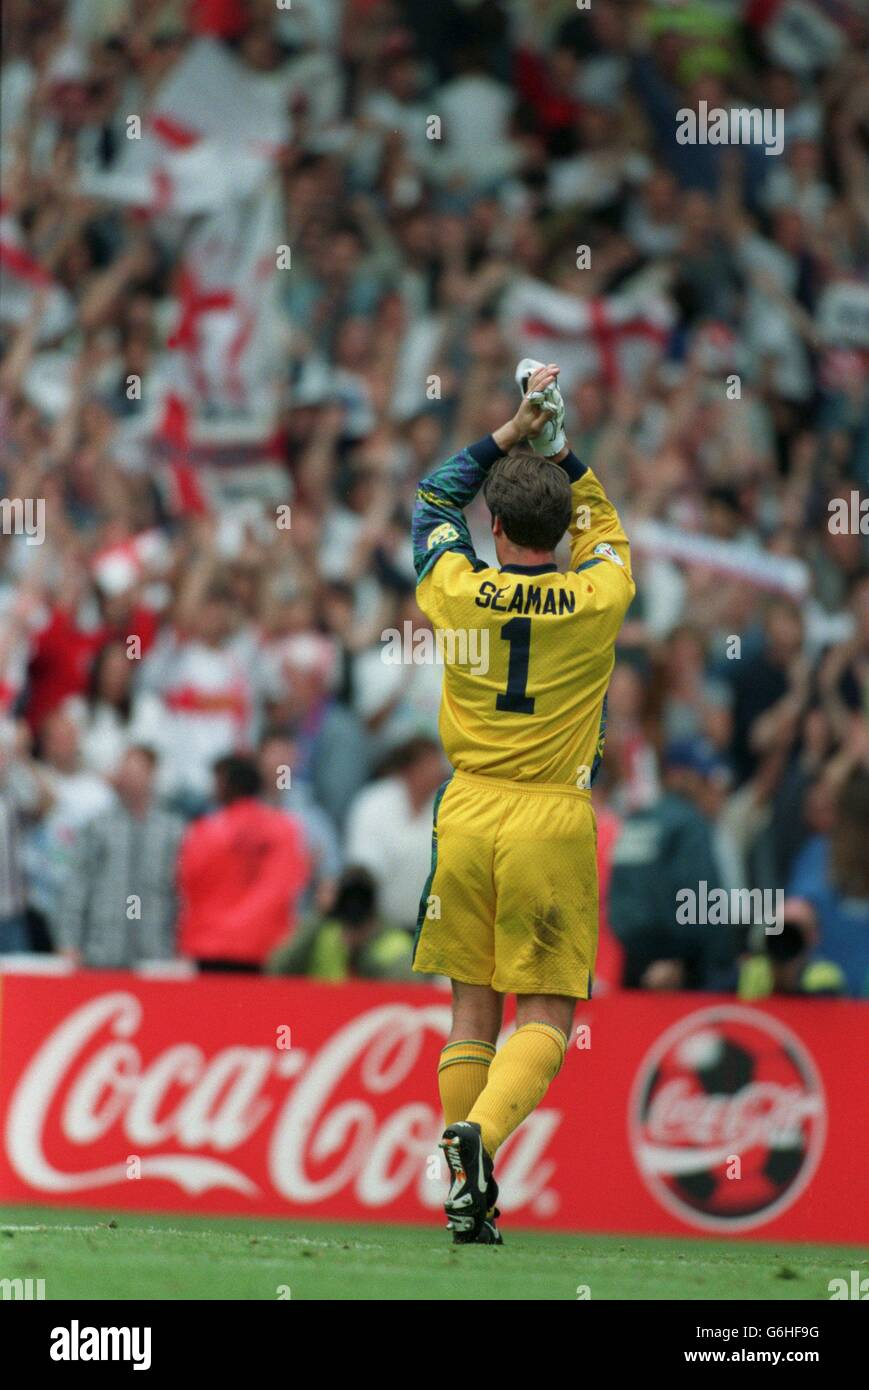 22-JUN-96 ..England v Spain ... England's David Seaman salutes the crowd Stock Photo